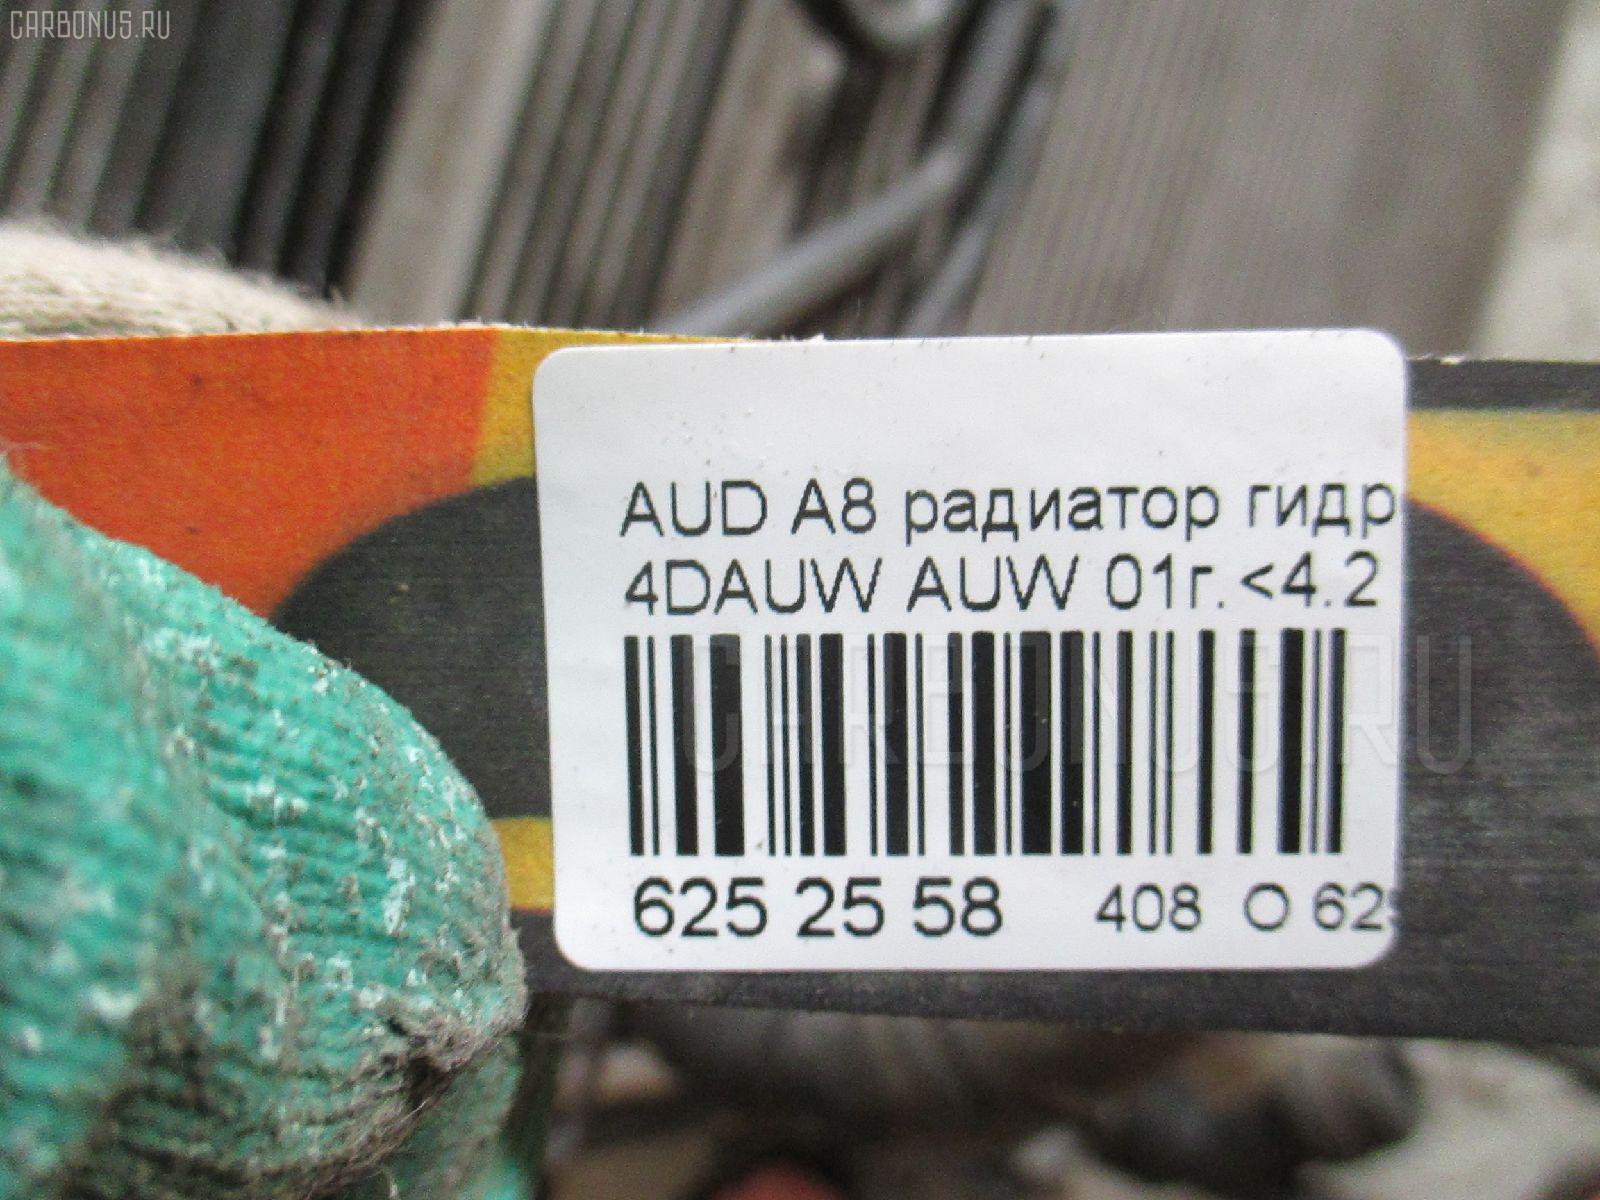 Радиатор гидроусилителя AUDI A8 4DAUW AUW Фото 2